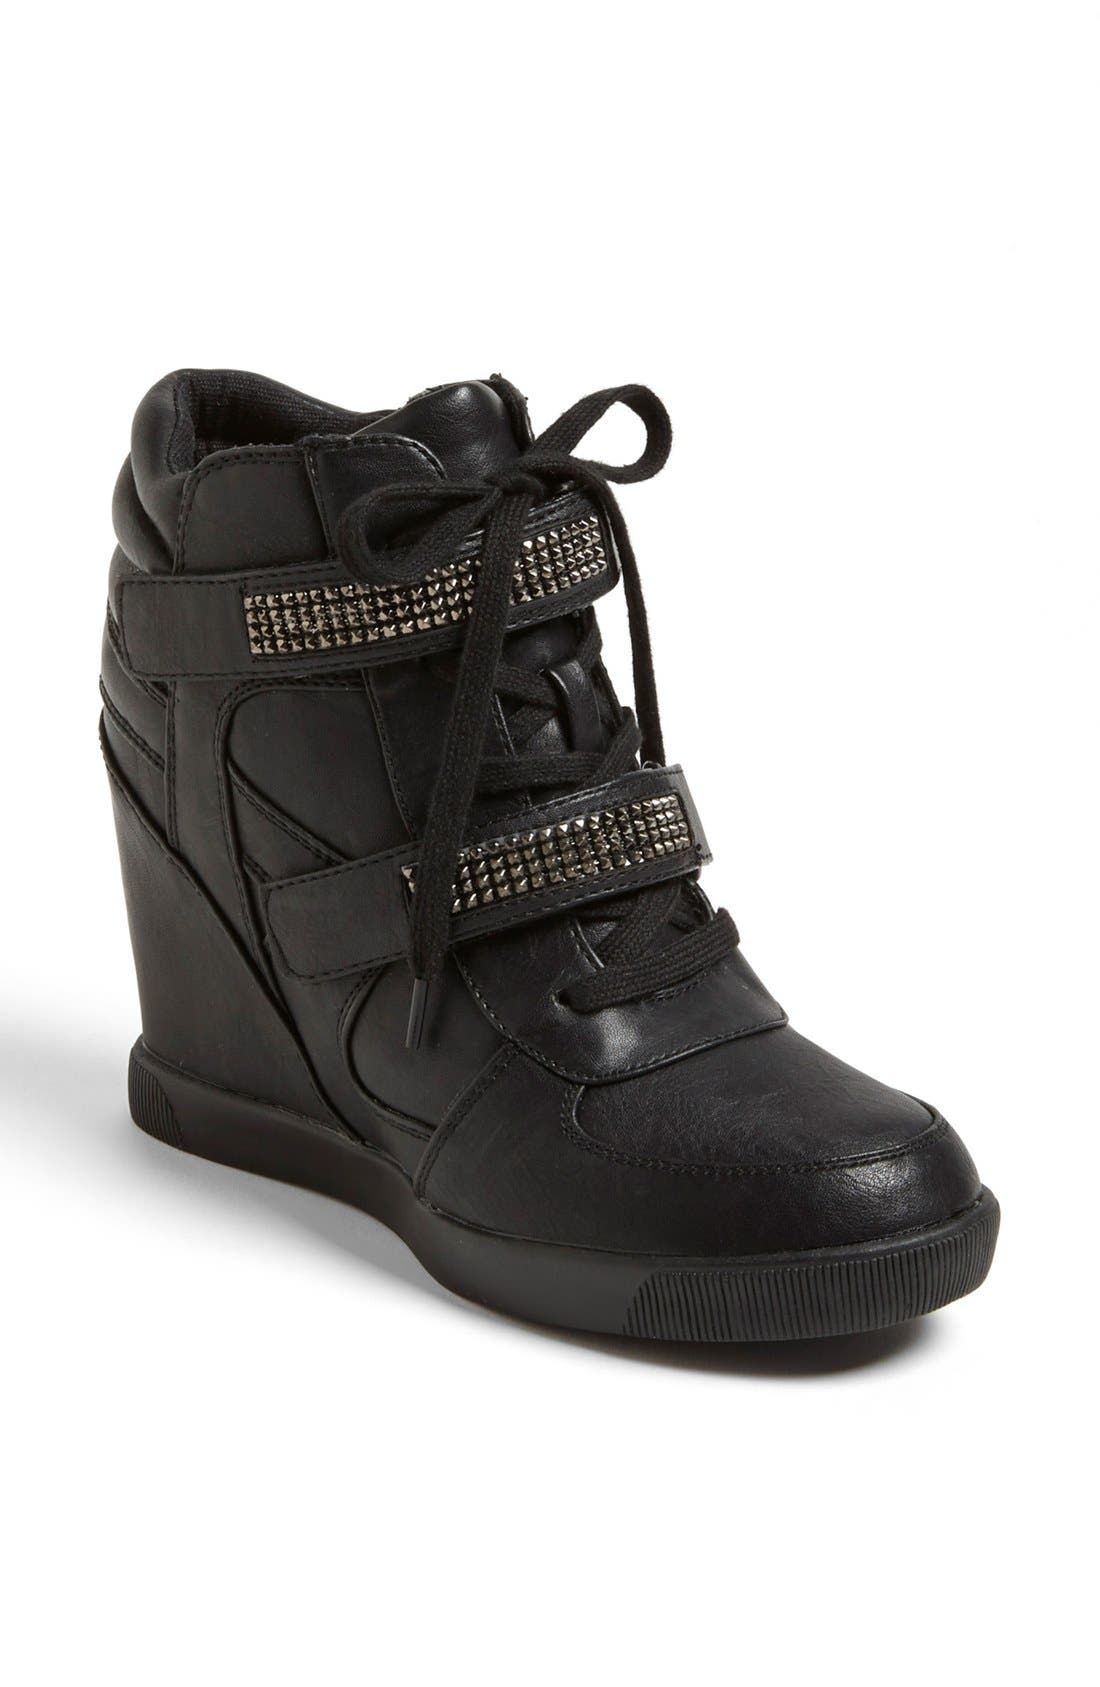 Main Image - MIA 'Flamee' Wedge Sneaker